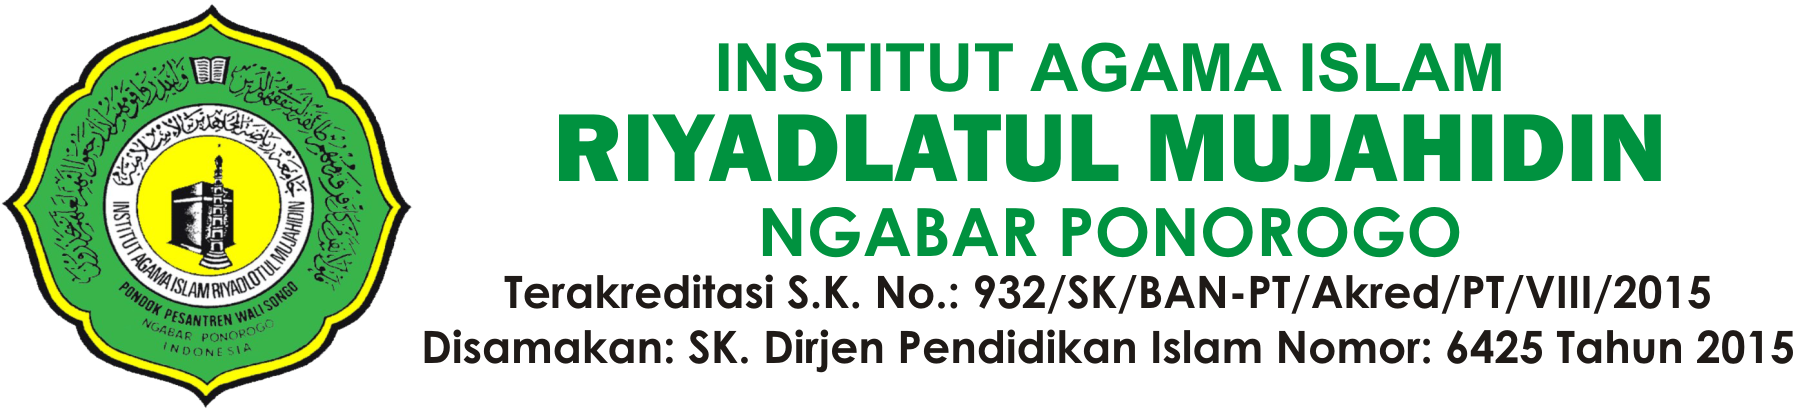 Institut Agama Islam Riyadlotul Mujahidin (IAIRM Ngabar)